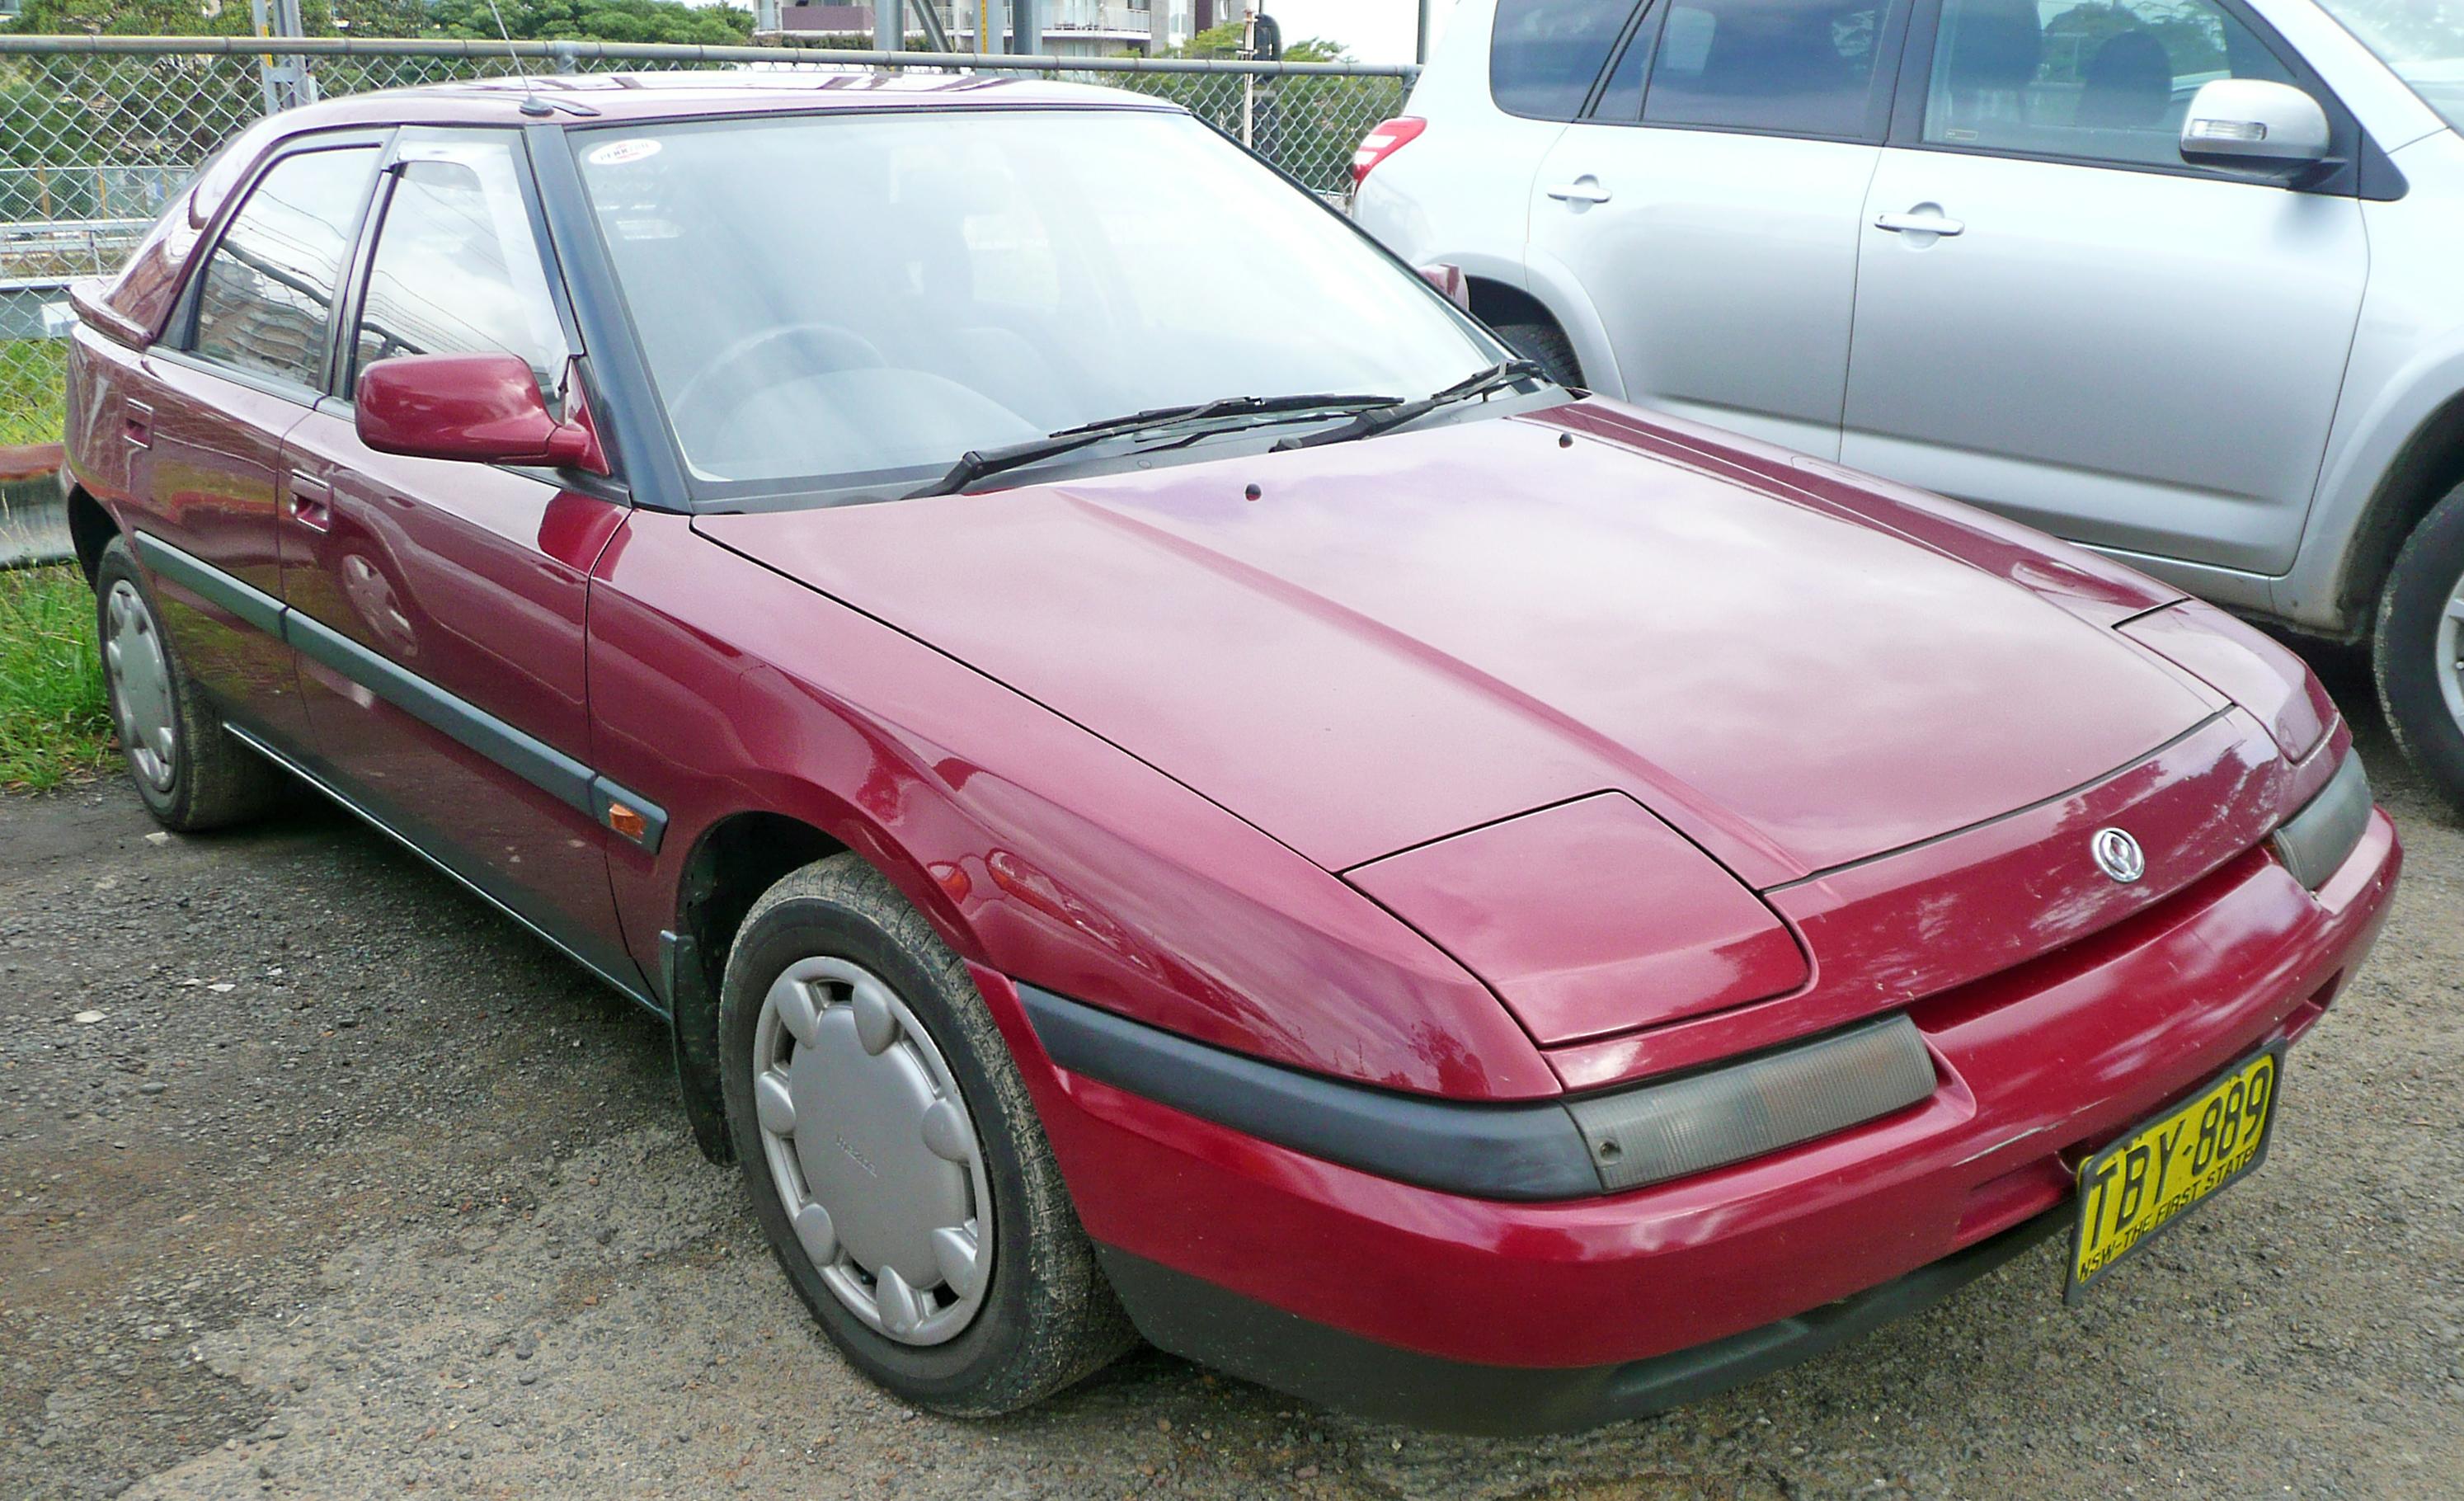 file:1991-1994 mazda 323 (bg series 2) astina 5-door hatchback 01